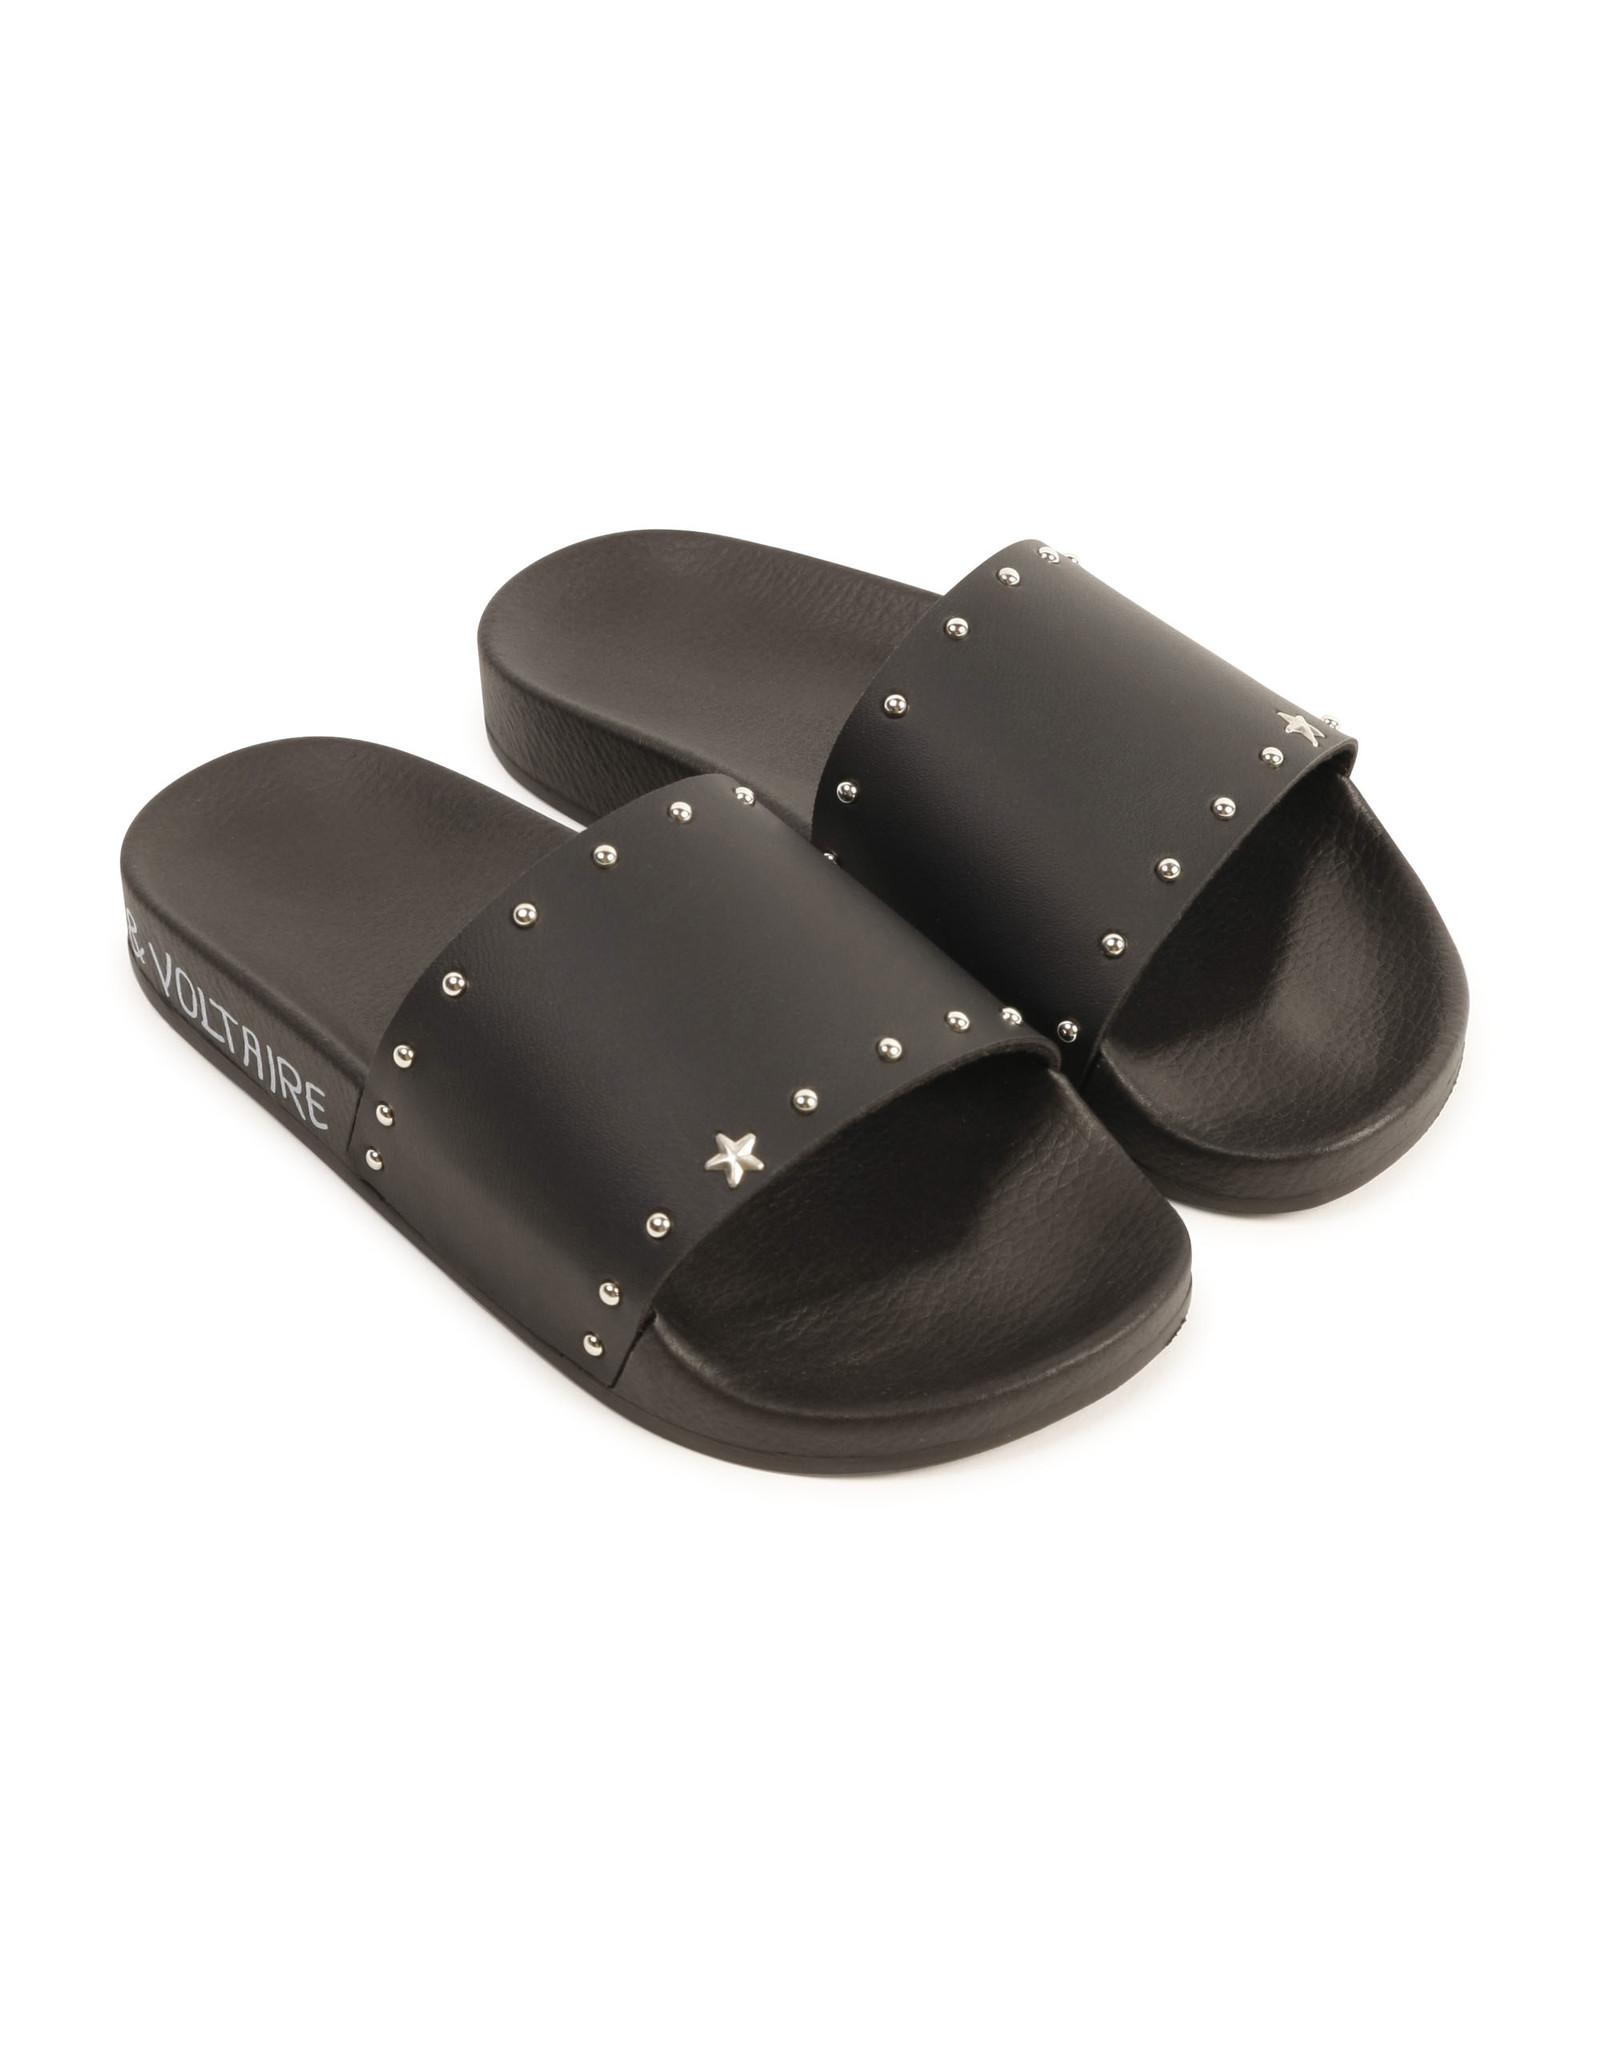 Zadig&Voltaire Z&V SS21 X19021 slippers